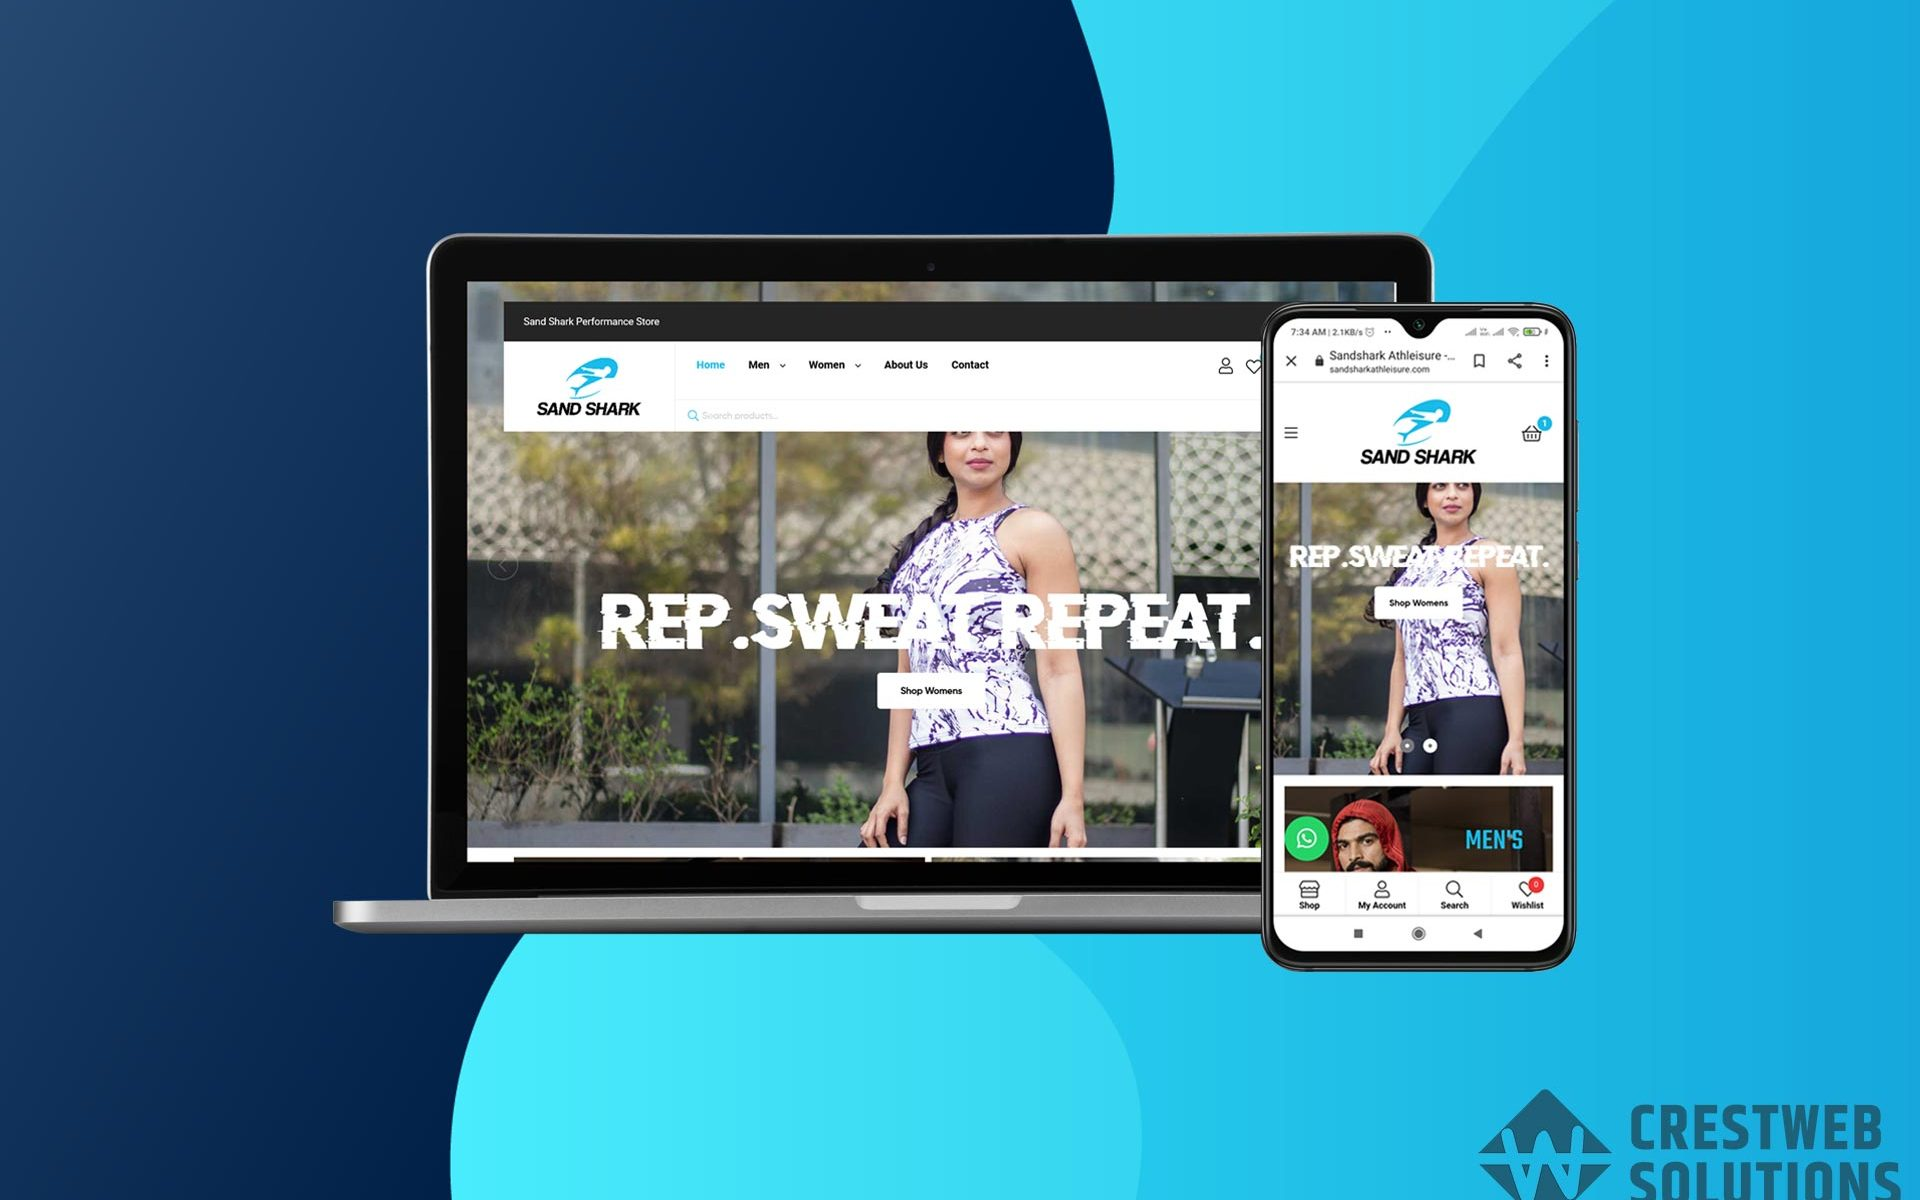 sandshark-athleisure-respionsive-website-in-mumbai-ecommerce-crestweb-solutions